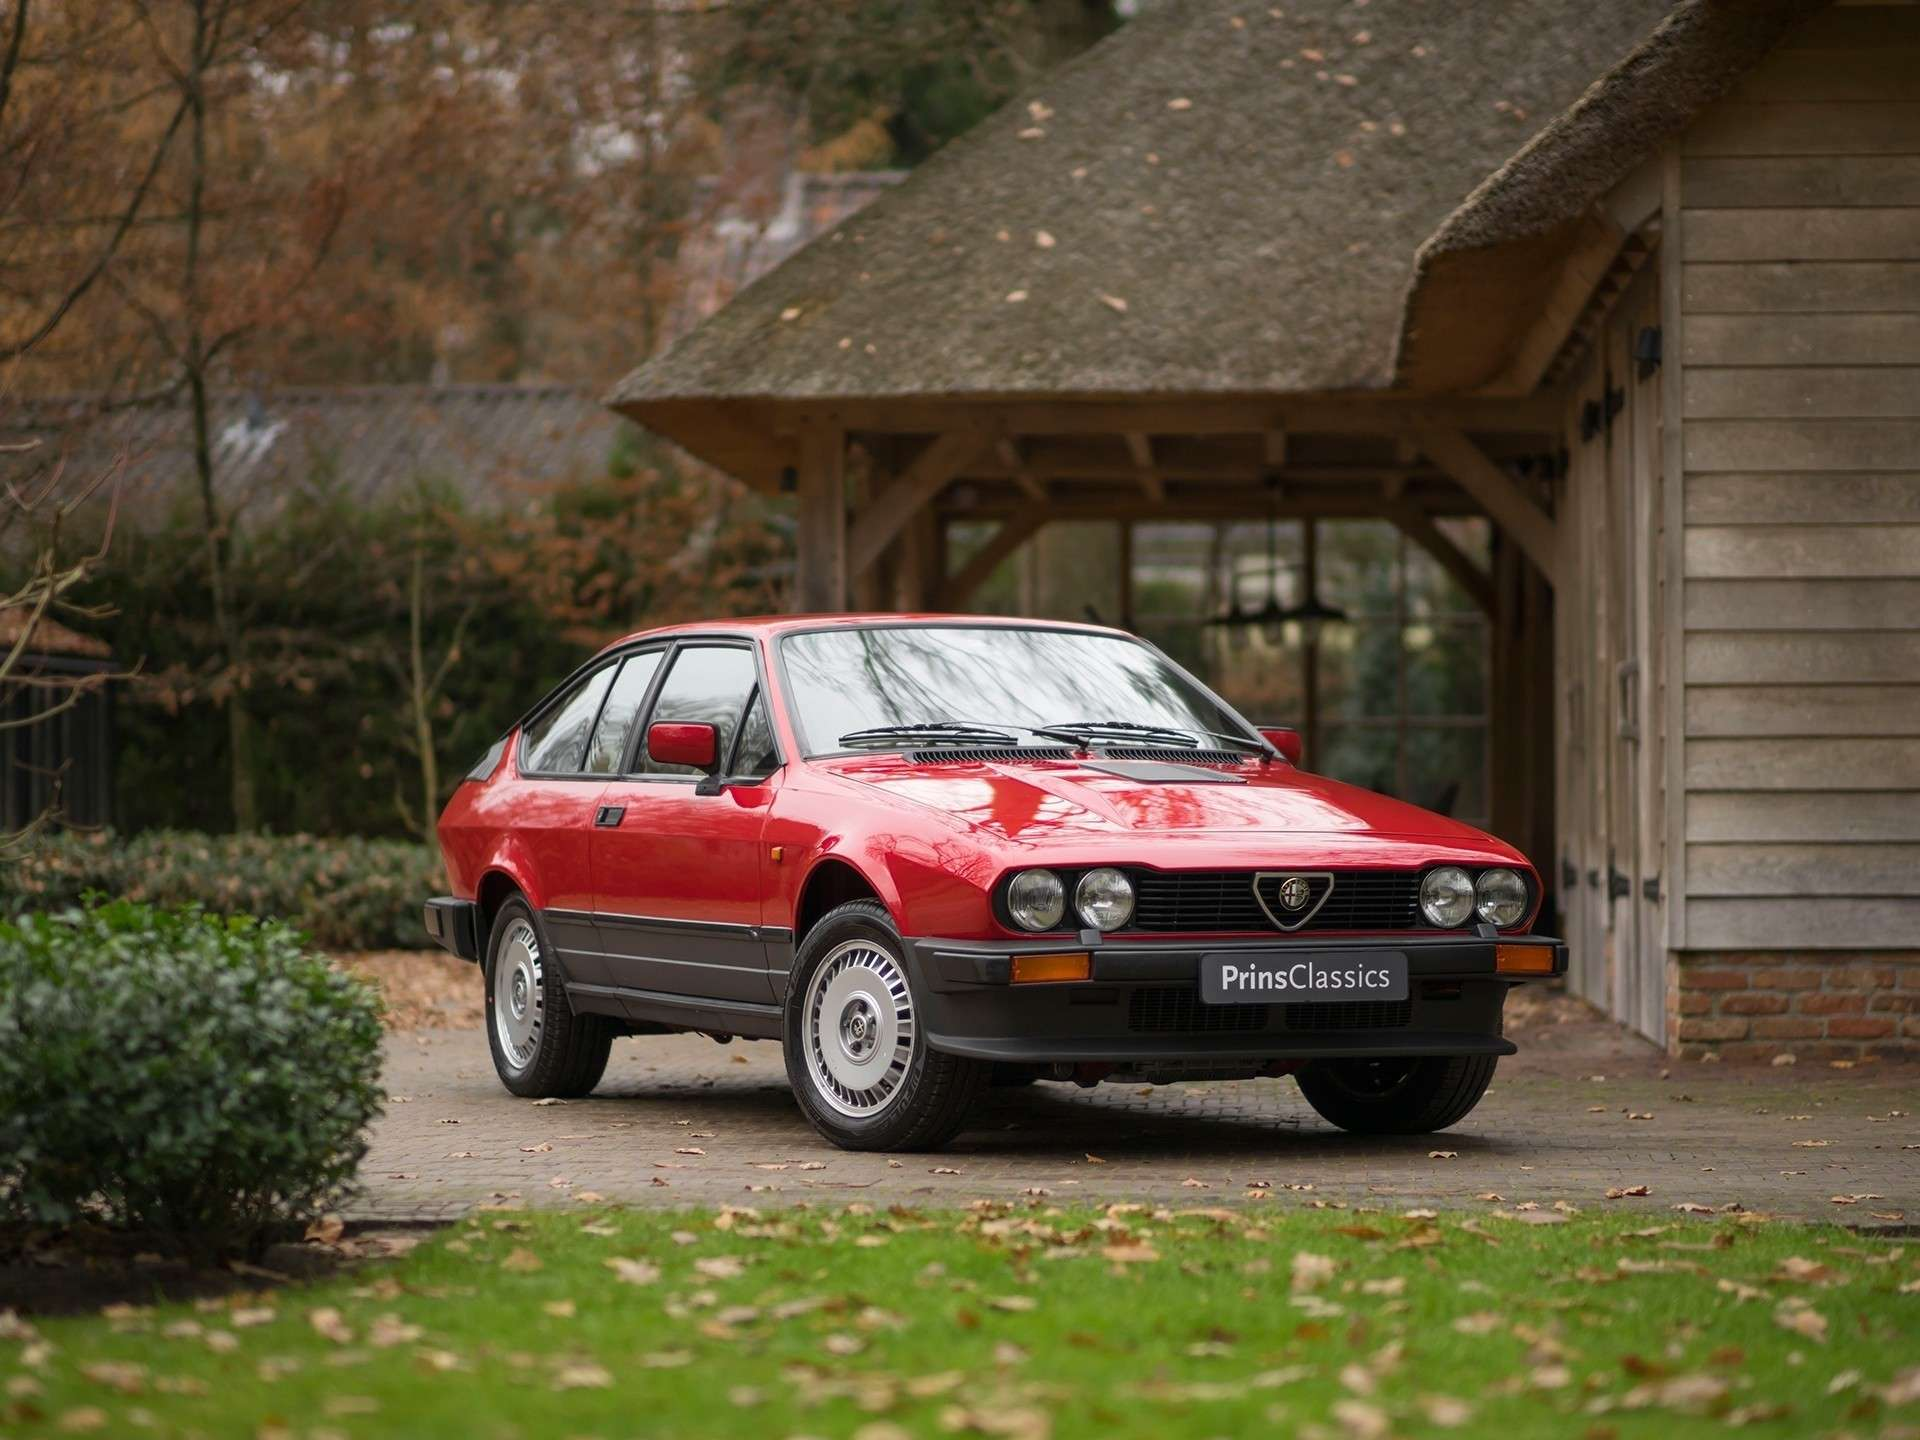 Alfa Romeo GTV 6 2.5 04